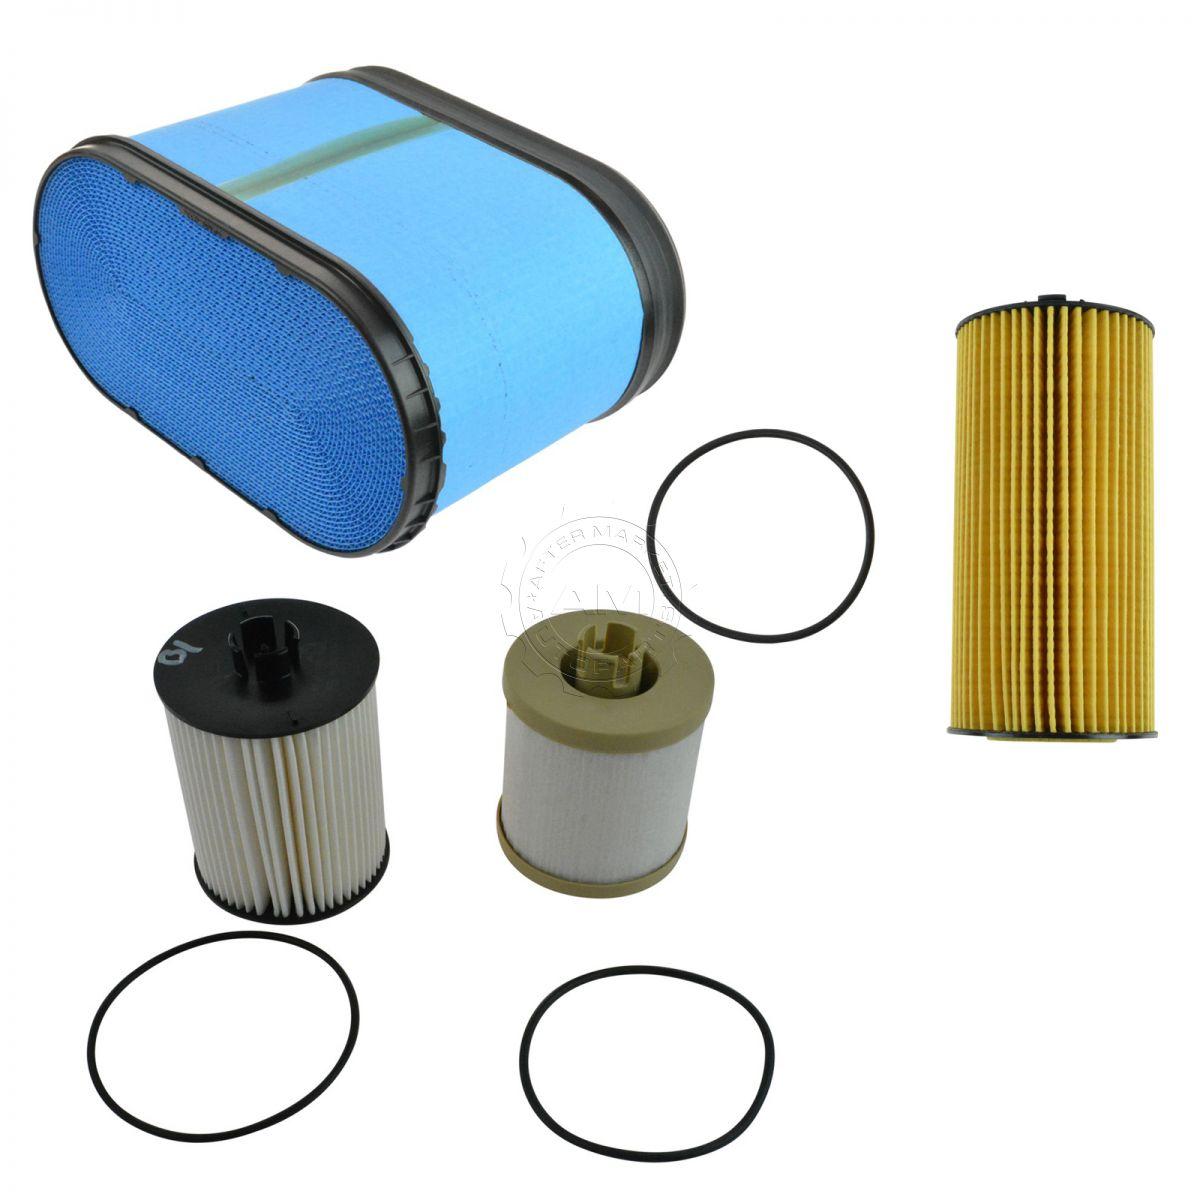 hight resolution of motorcraft air oil fuel filter set of 3 for 08 10 6 4l powerstroke turbo